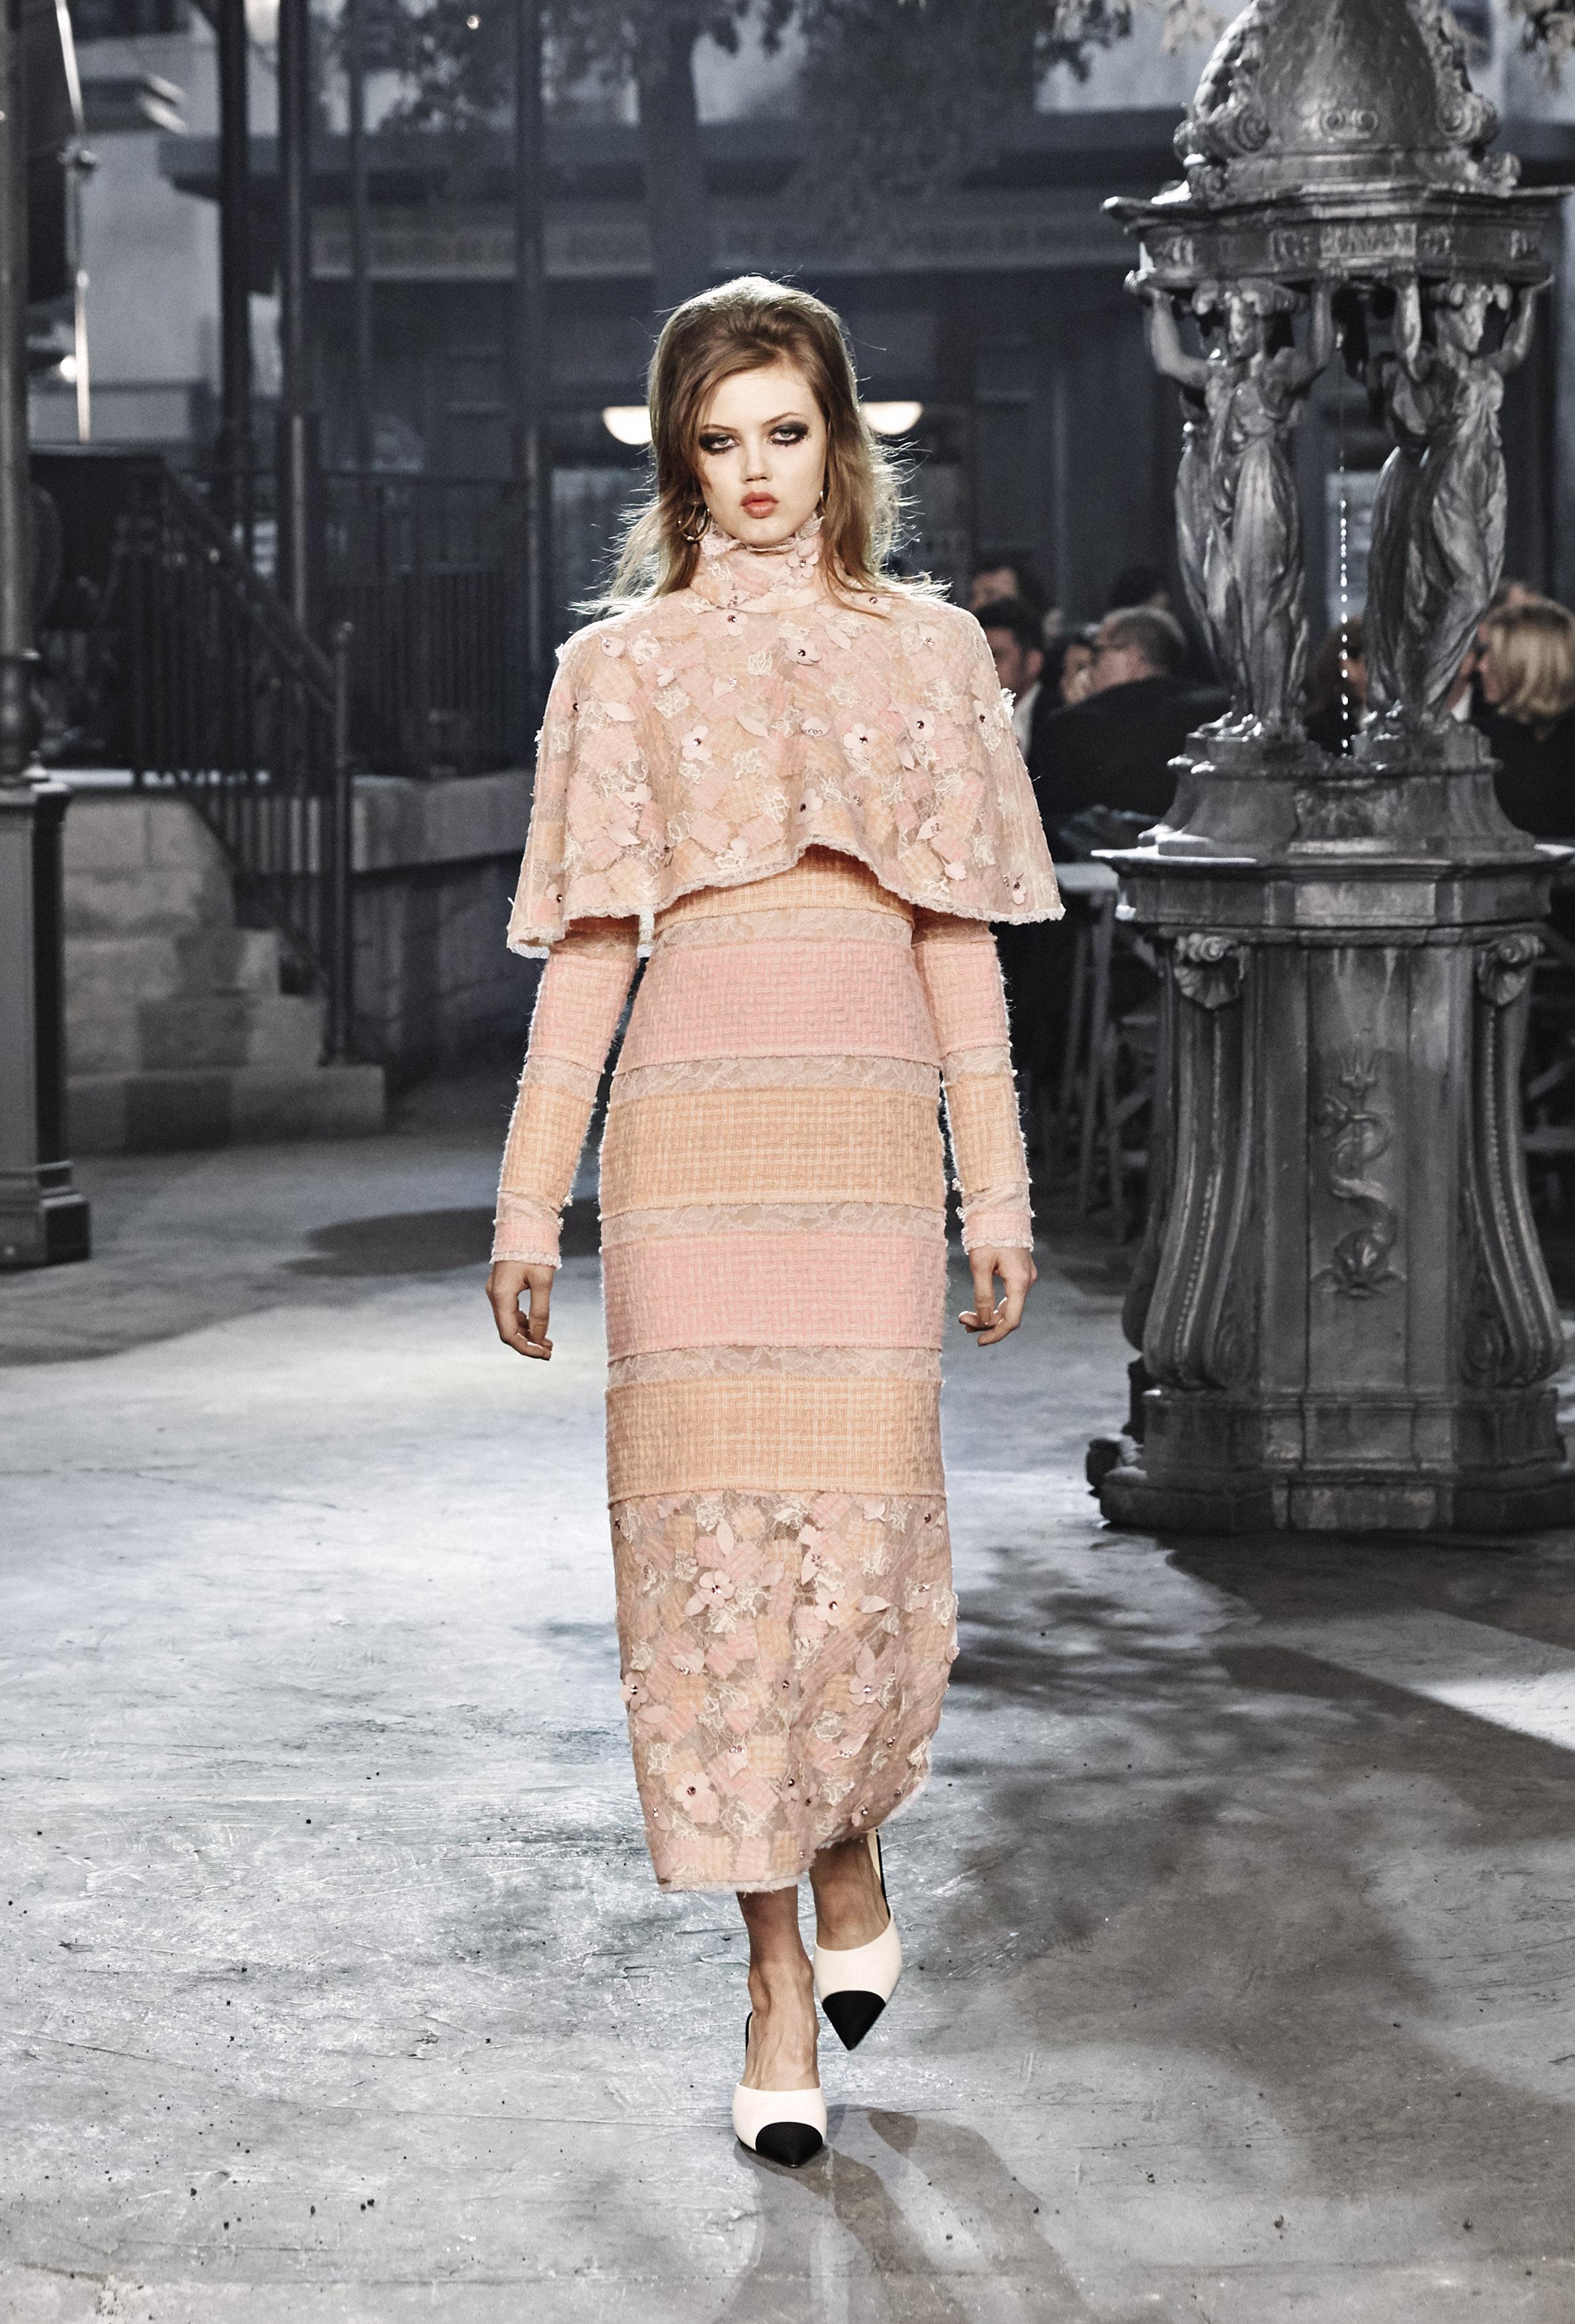 Chanel Métiers d'art, le foto della sfilata Paris in Rome 2015/16